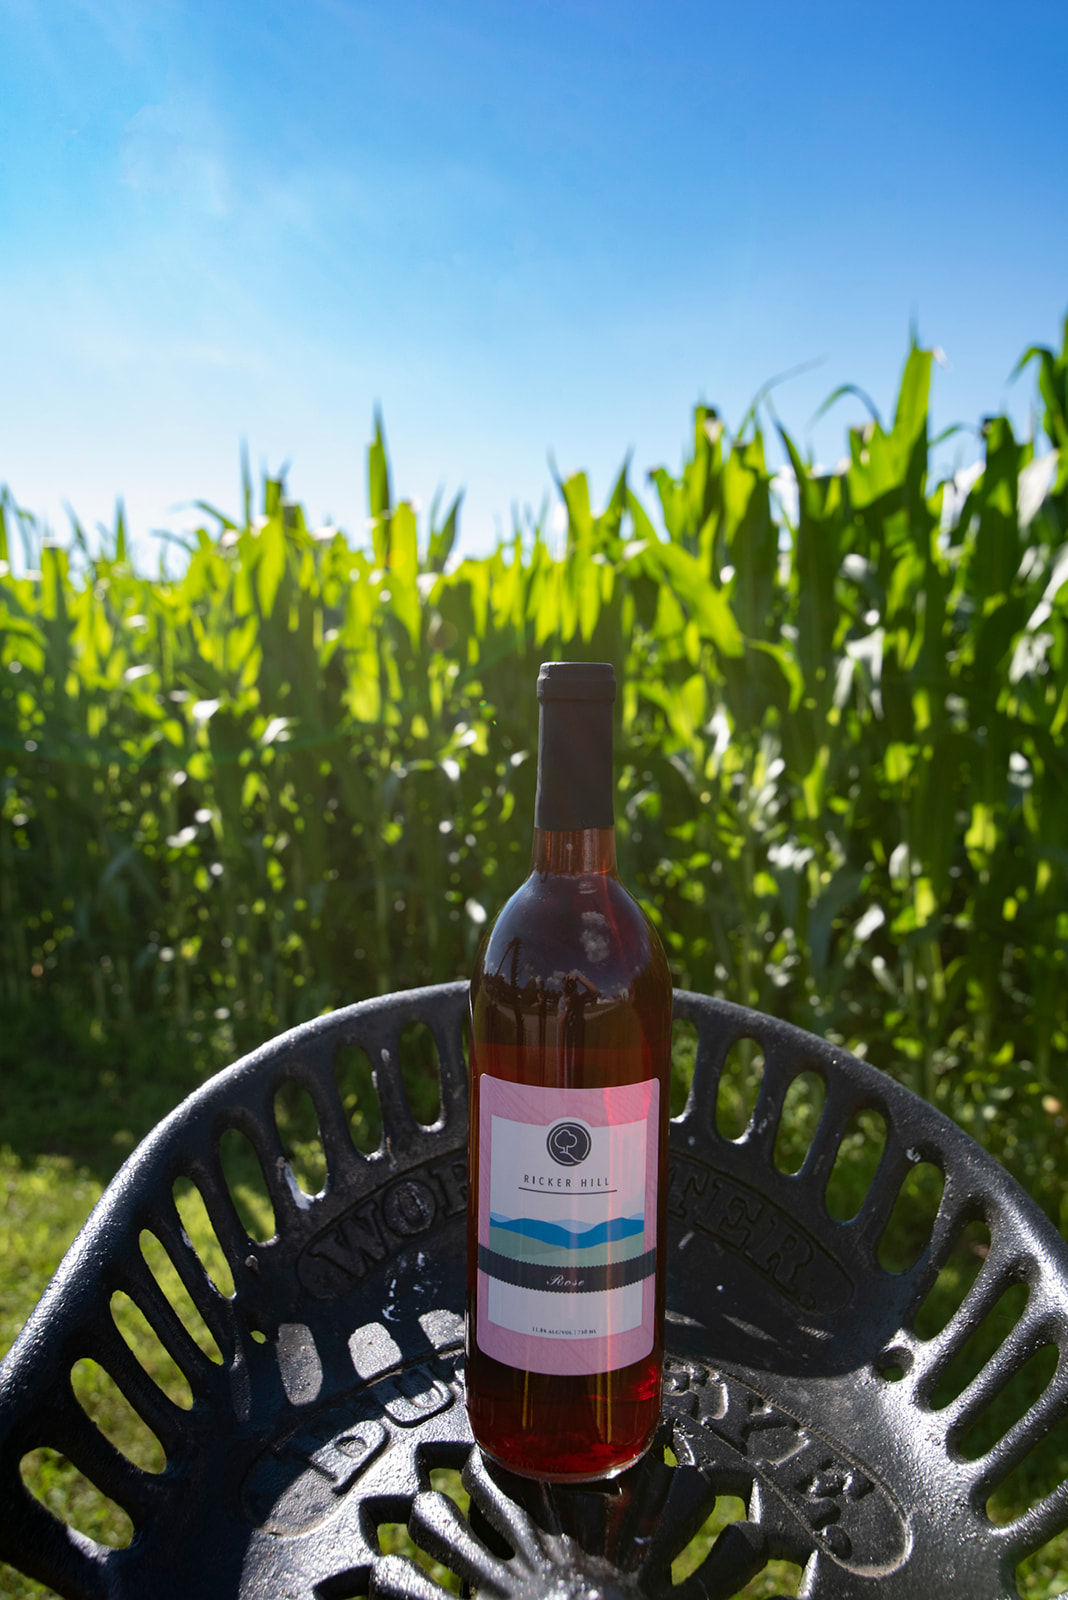 Ricker Hill Rose wine